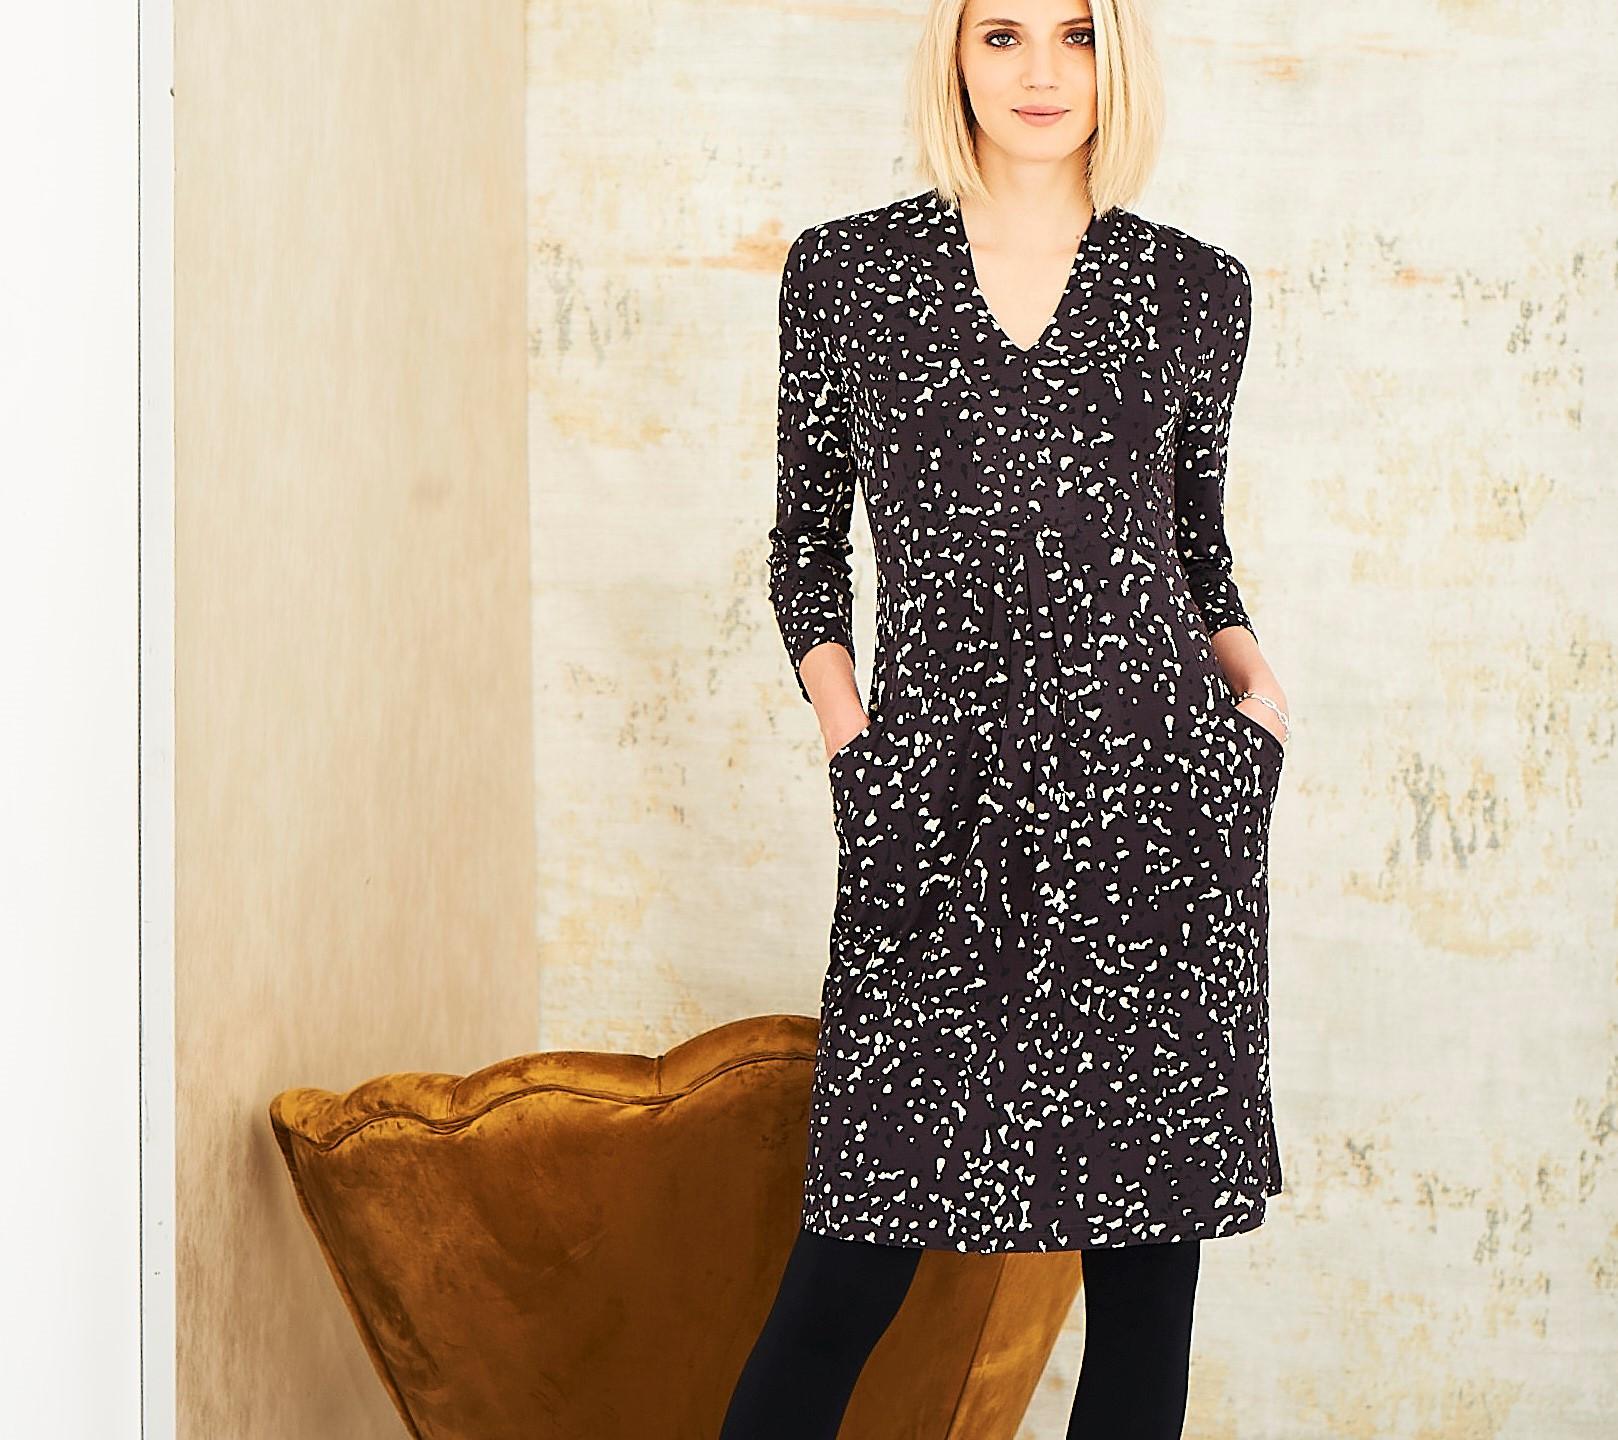 Adini Lapwing Dress Charcoal £80